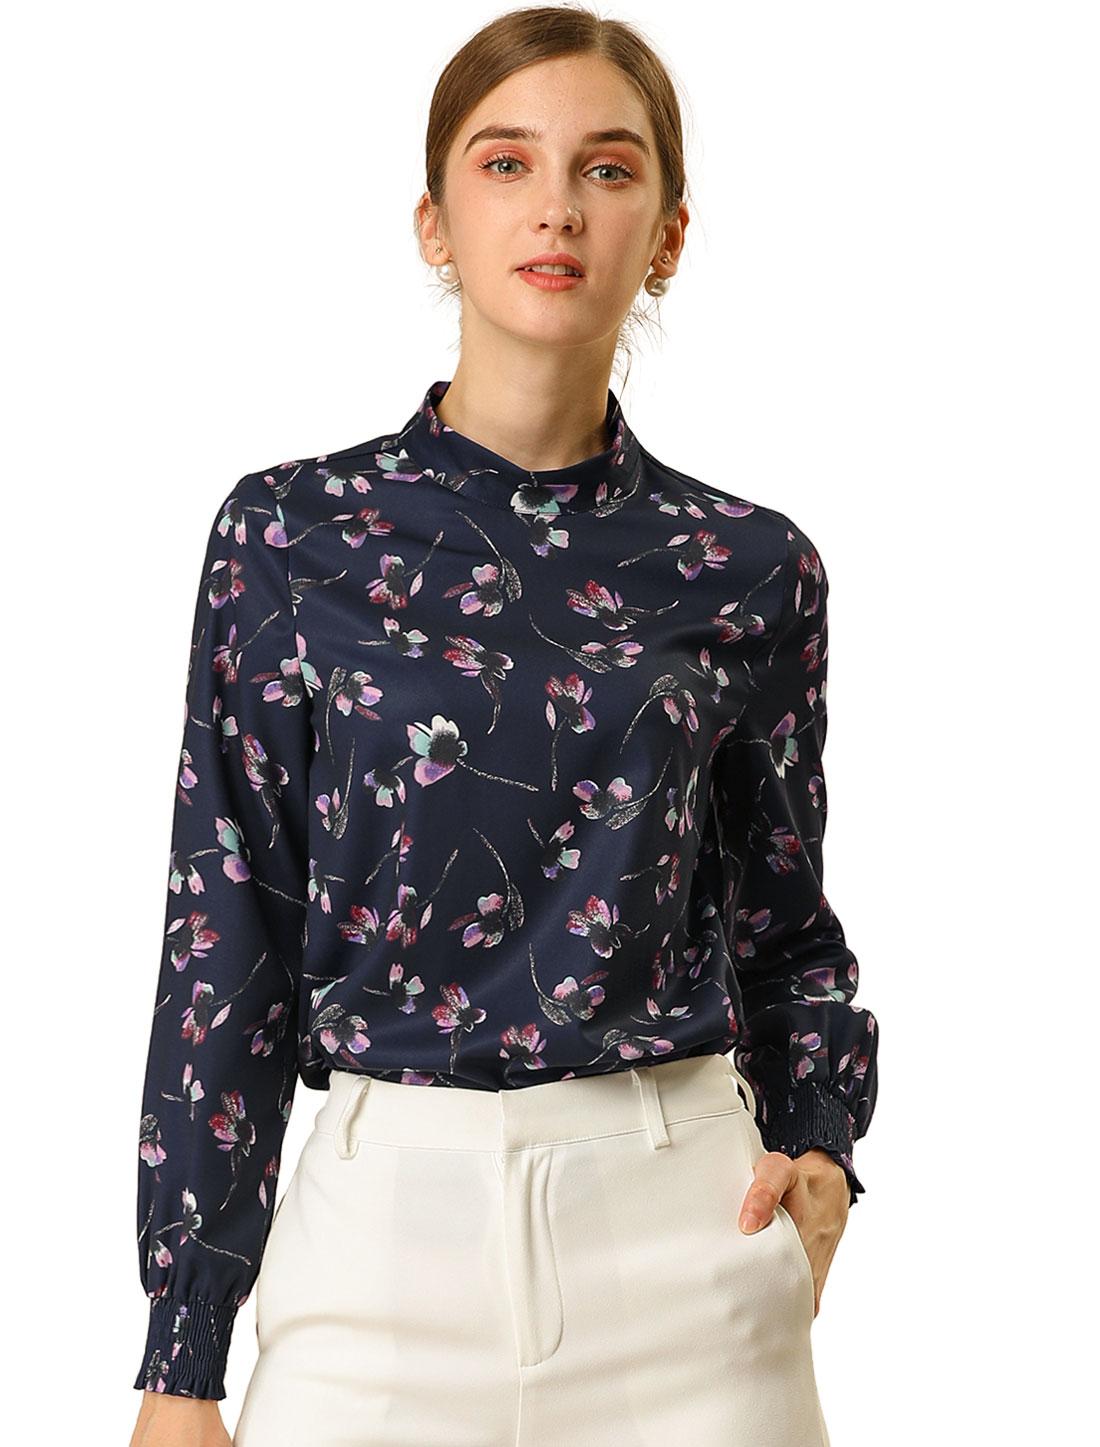 Allegra K Women's Floral Print Mock Neck Long Sleeve Blouse Dark Blue XL